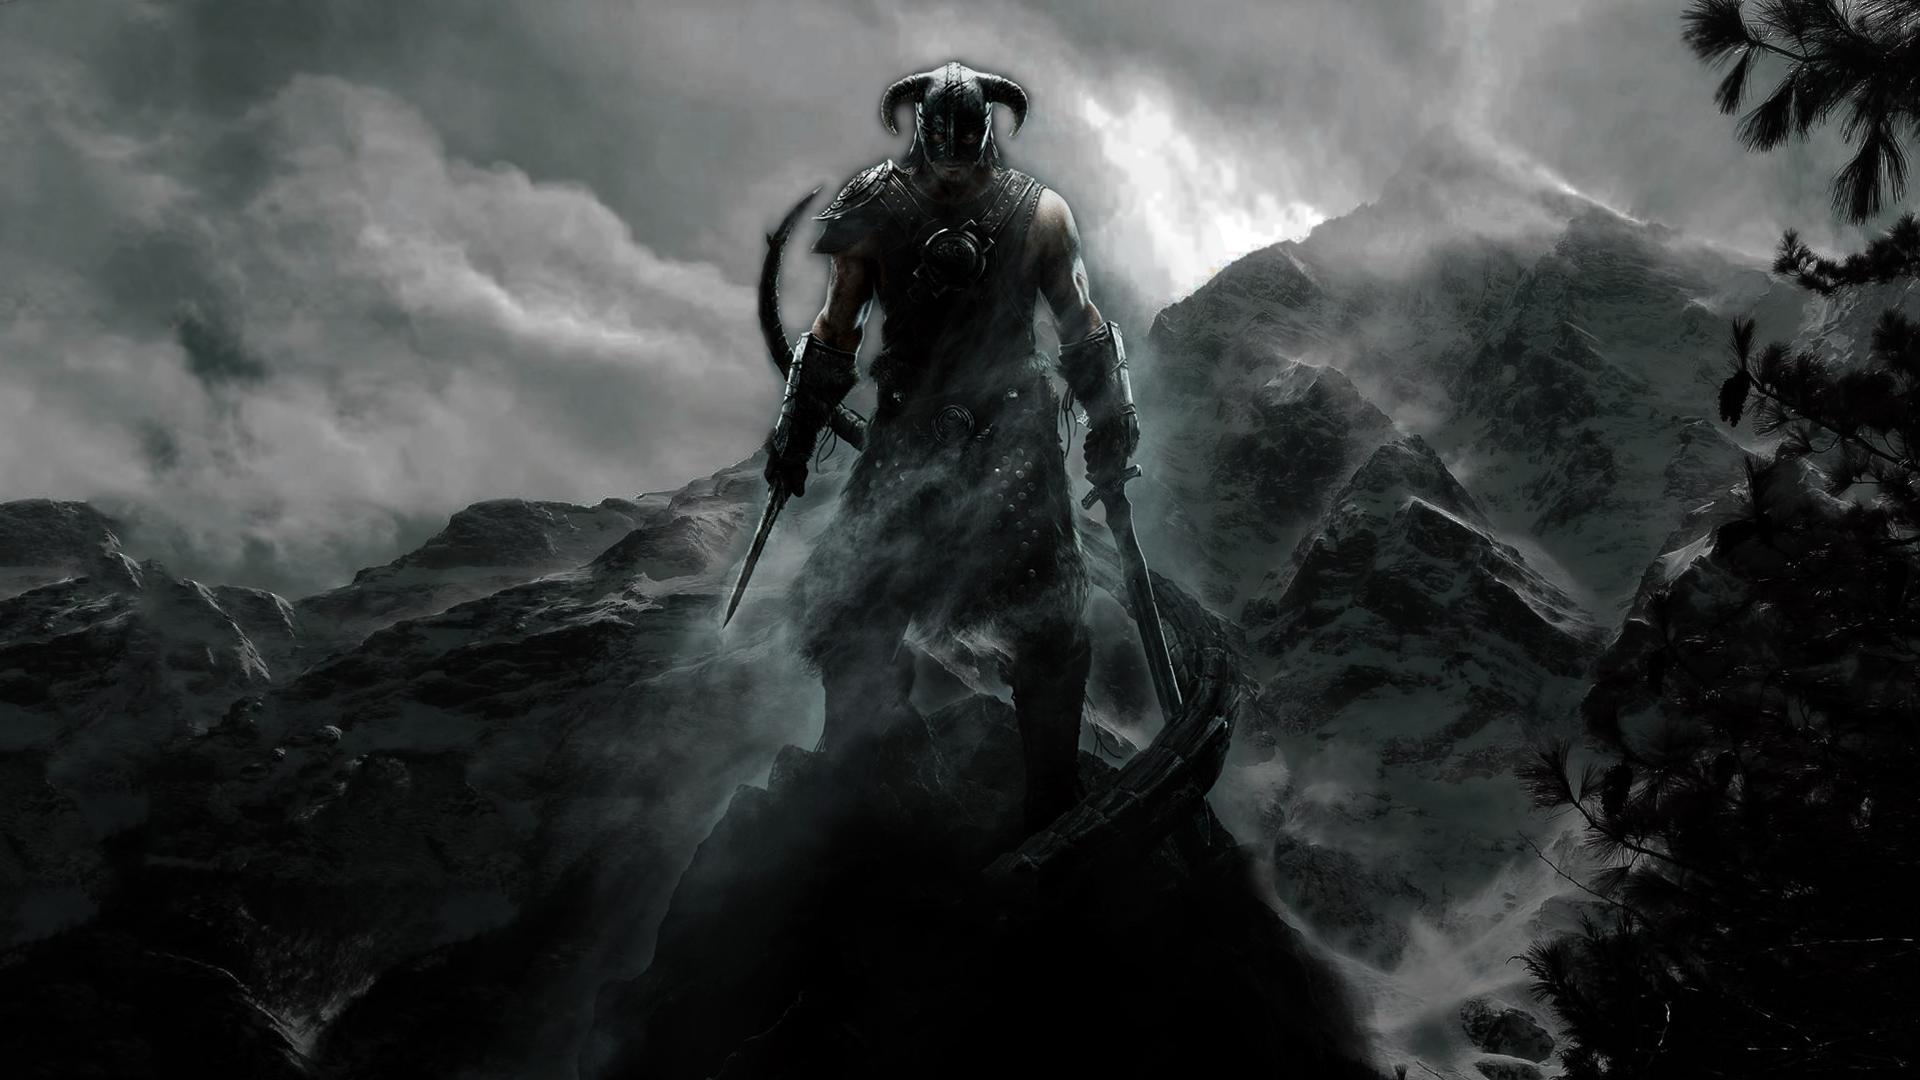 Download Wallpaper 1920x1080 The Elder Scrolls Warrior Mountain